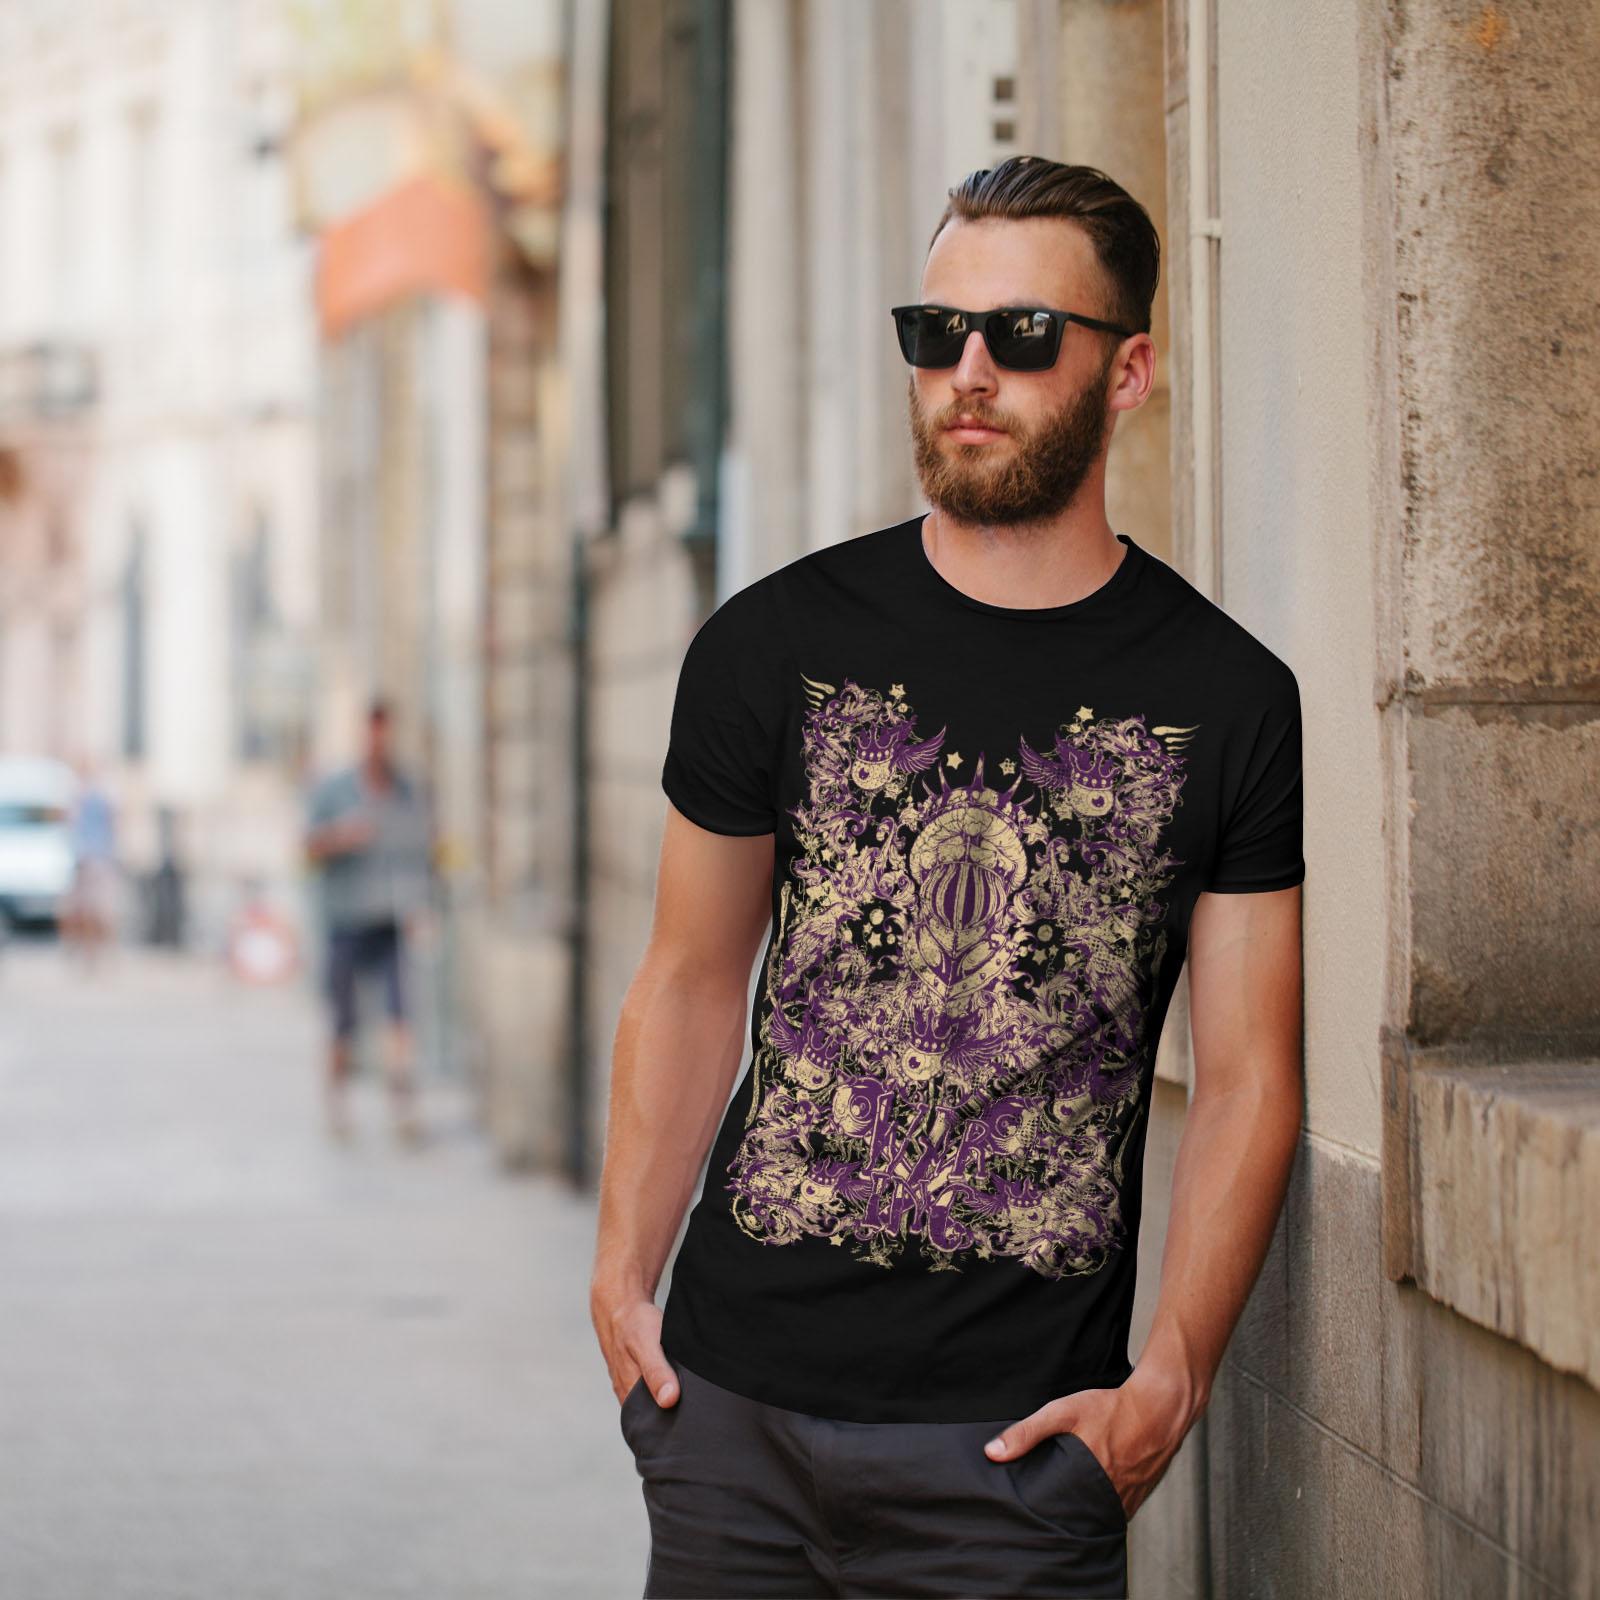 Wellcoda-War-Inc-Zombie-Mens-T-shirt-Monster-Graphic-Design-Printed-Tee thumbnail 5